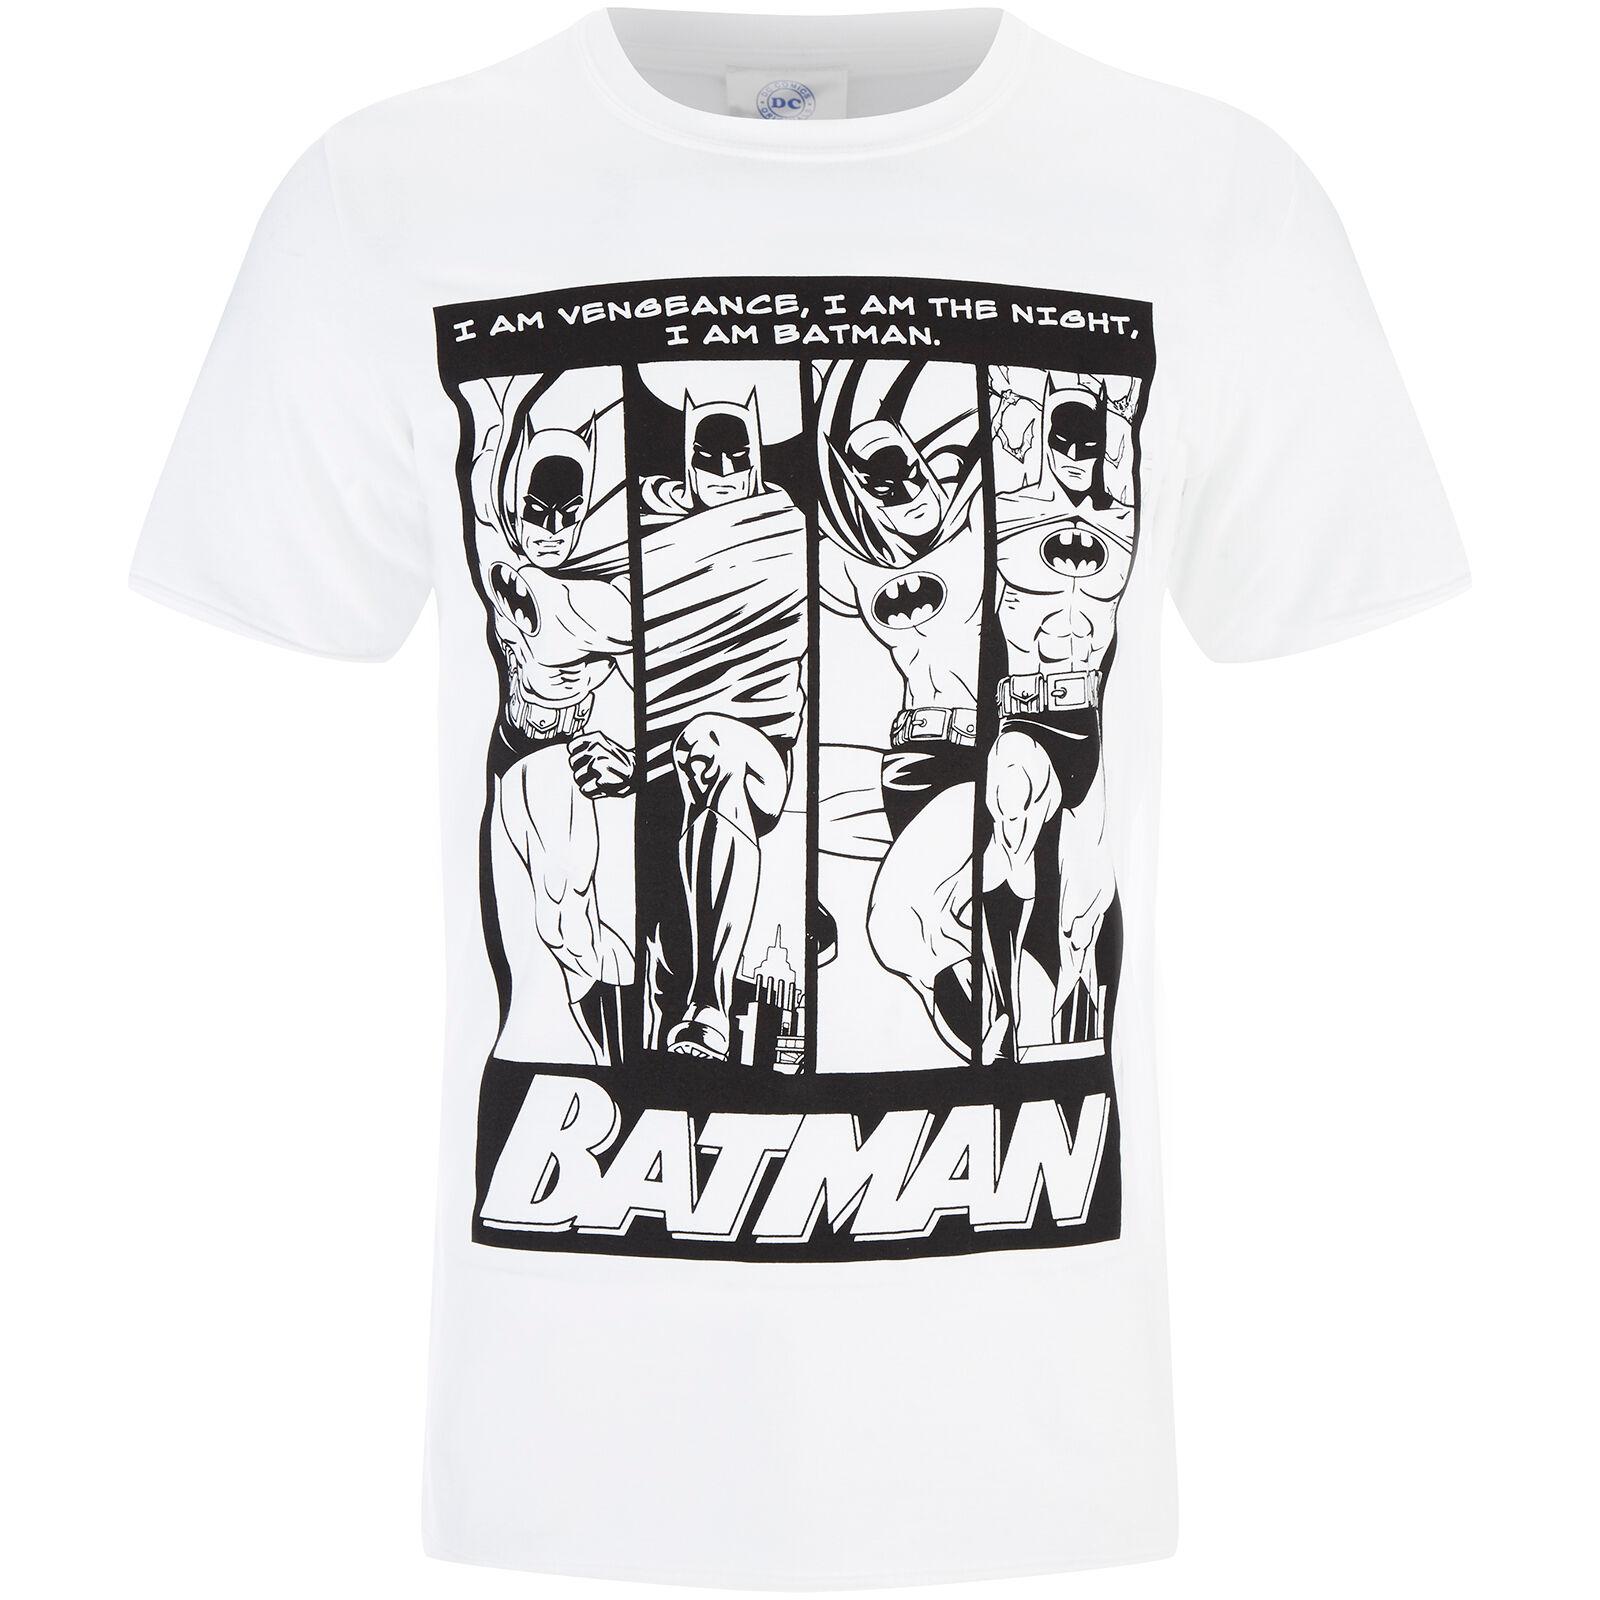 Geek Clothing DC Comics Men's Batman I am Batman T-Shirt - White - XXL - White